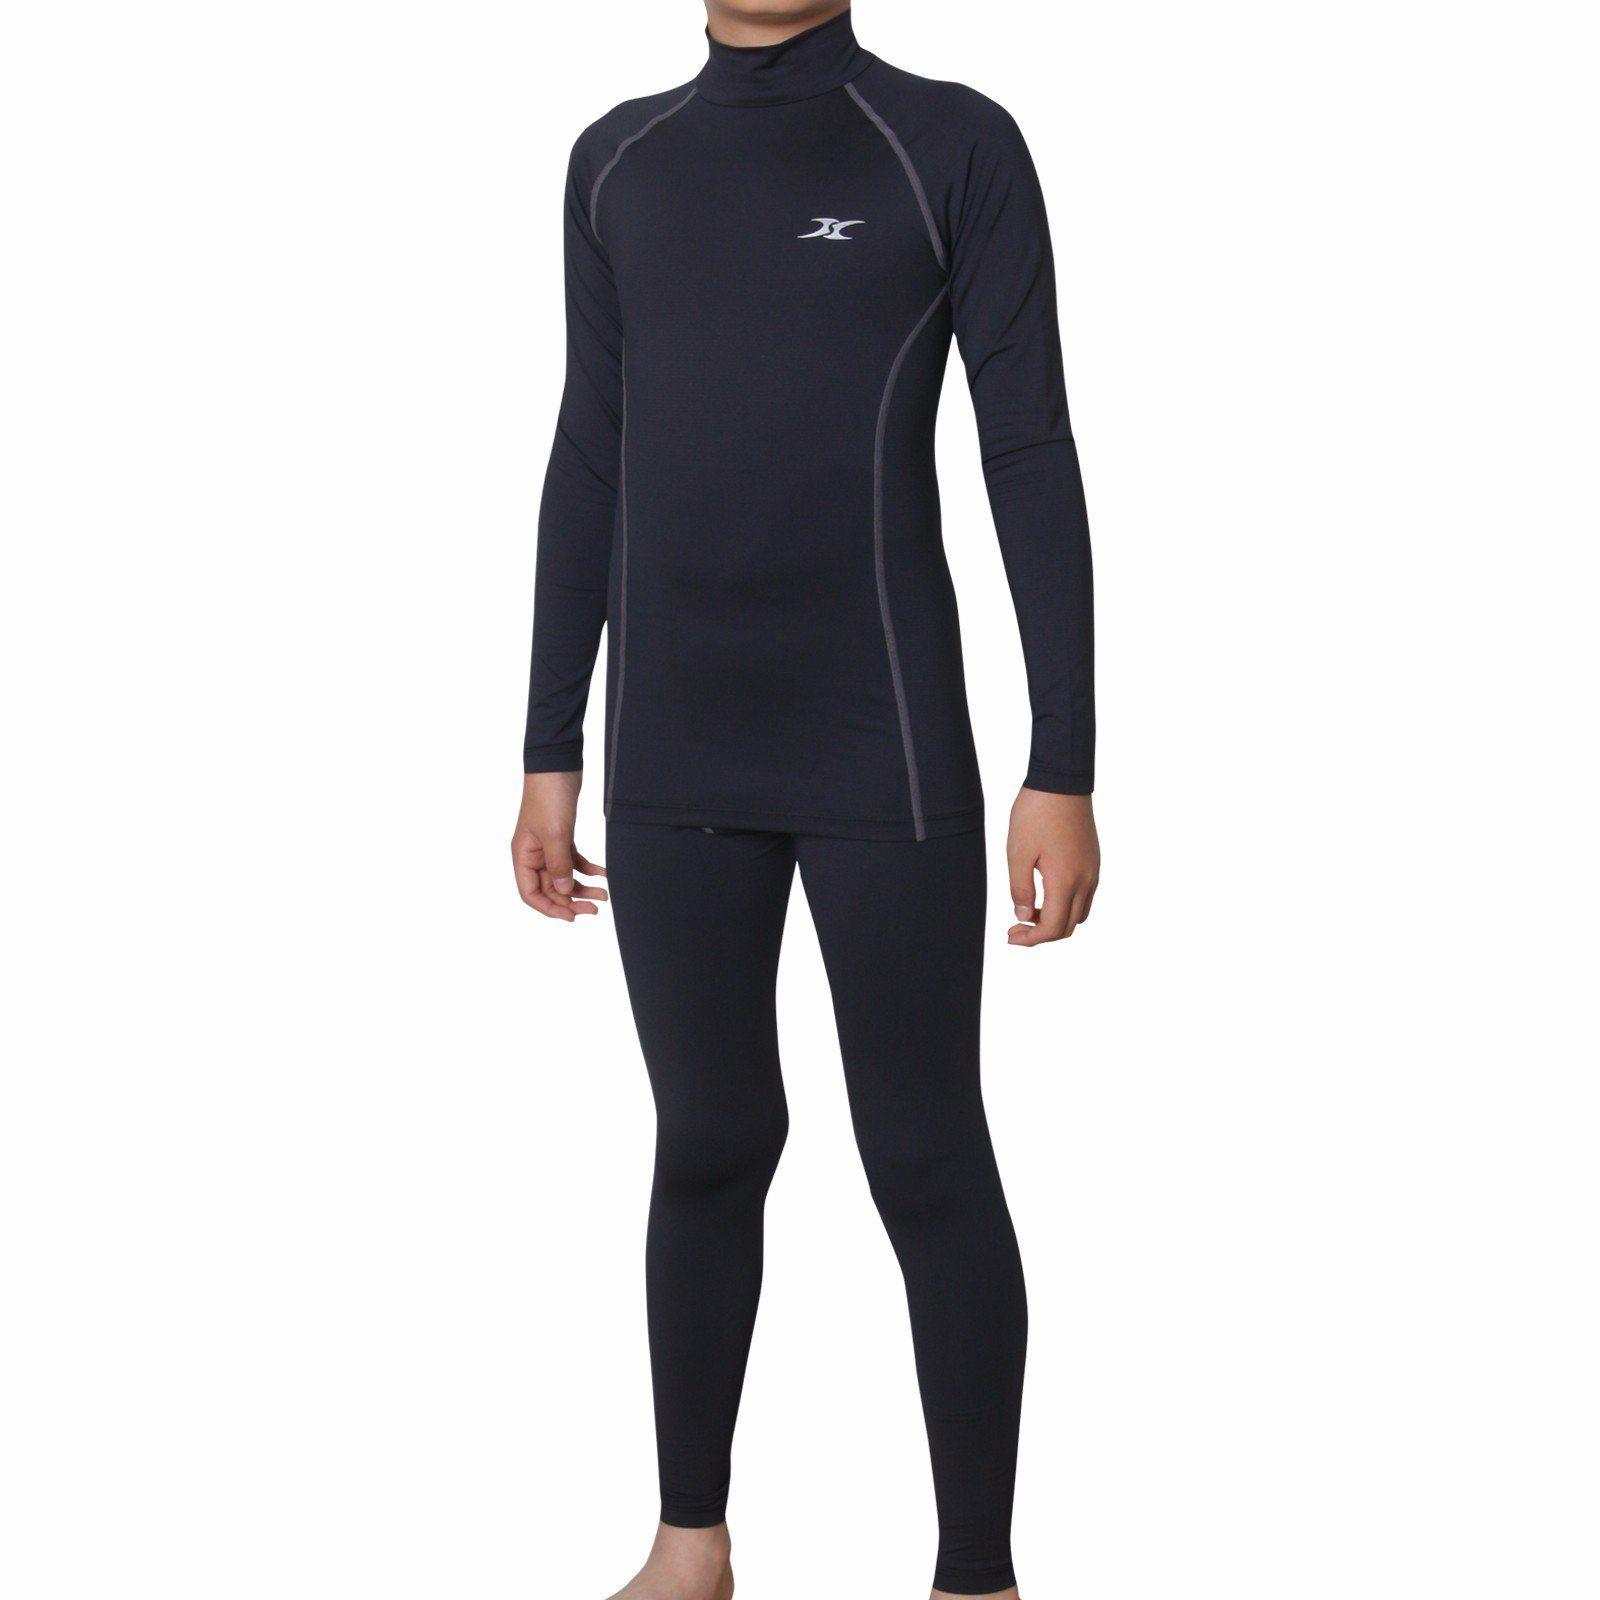 Thermal Underwear Kids Base Layer Compression Pants Shirt Tights Set NPLK BK S